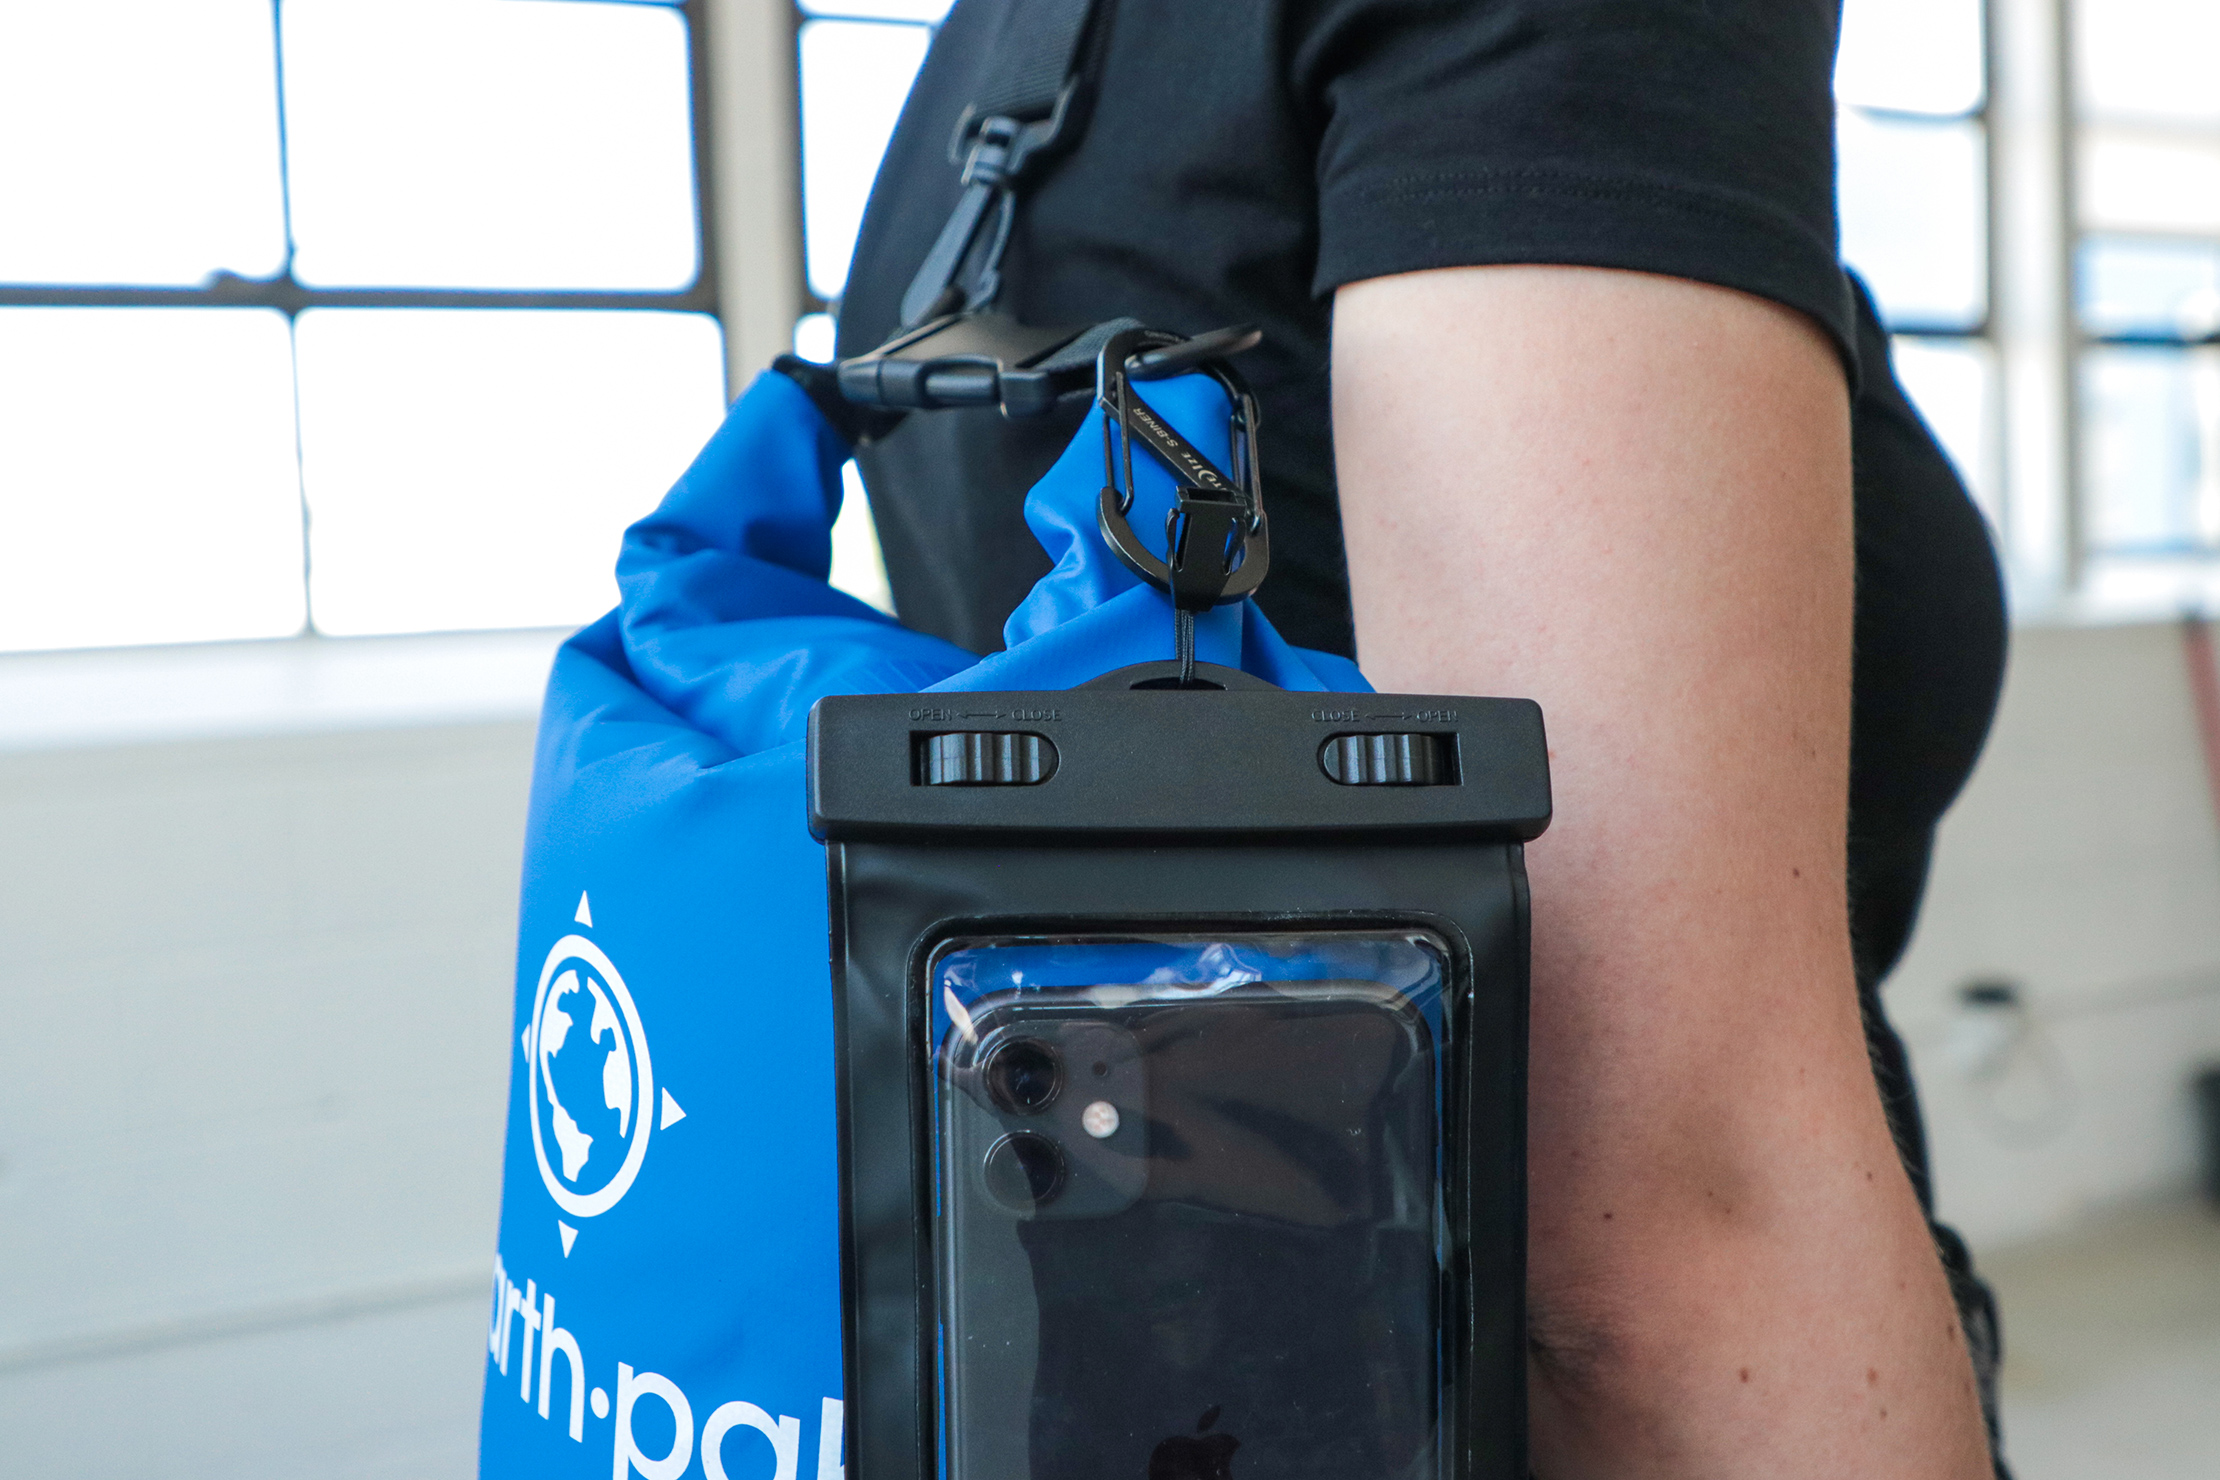 Earth Pak Original Waterproof Dry Bag With Phone Pocket